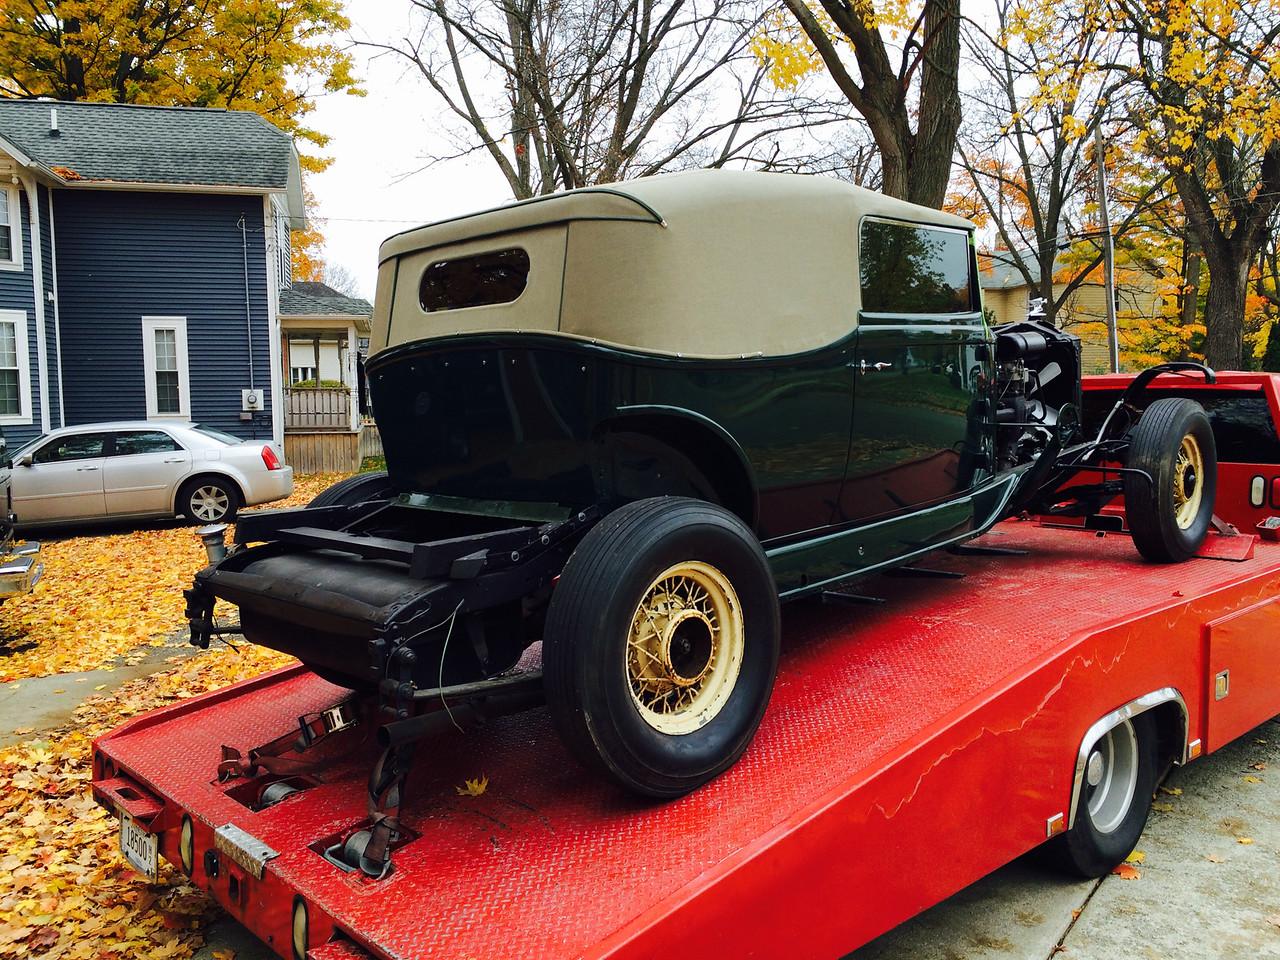 1934 Packard Super Eight Convertible Victoria by Dietrich (Homer, Michigan to Nashville, Tennessee)